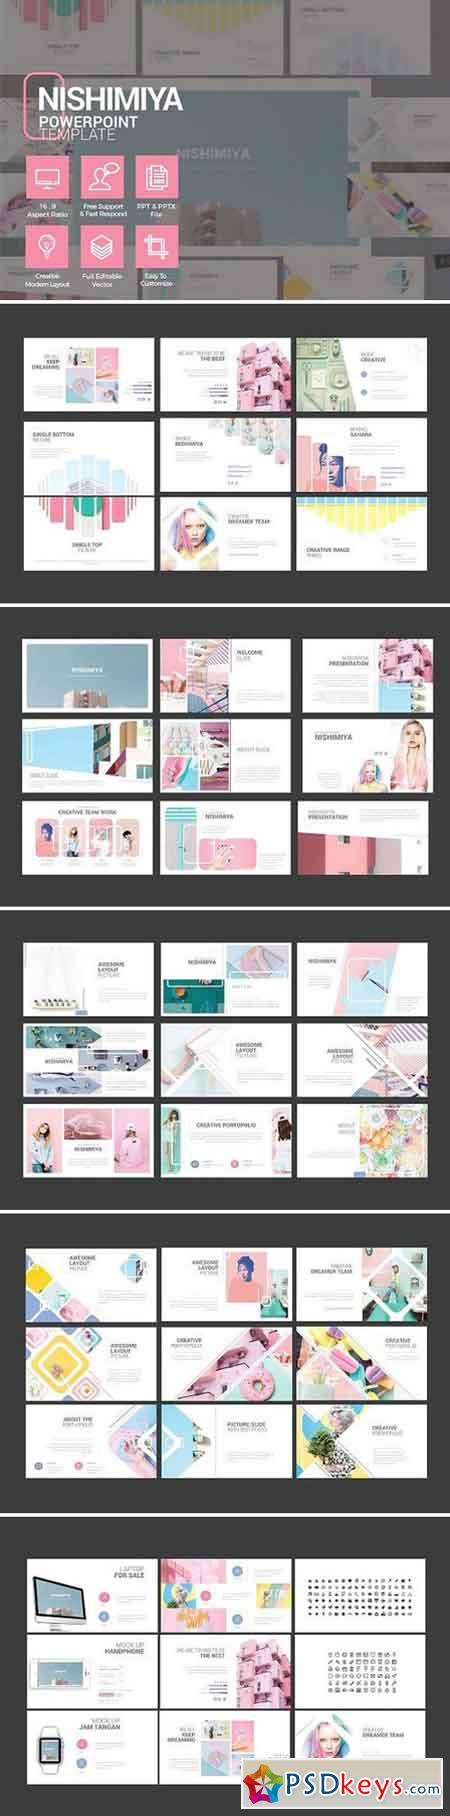 nishimaya - presentation template 1794067 » free download, Presentation templates